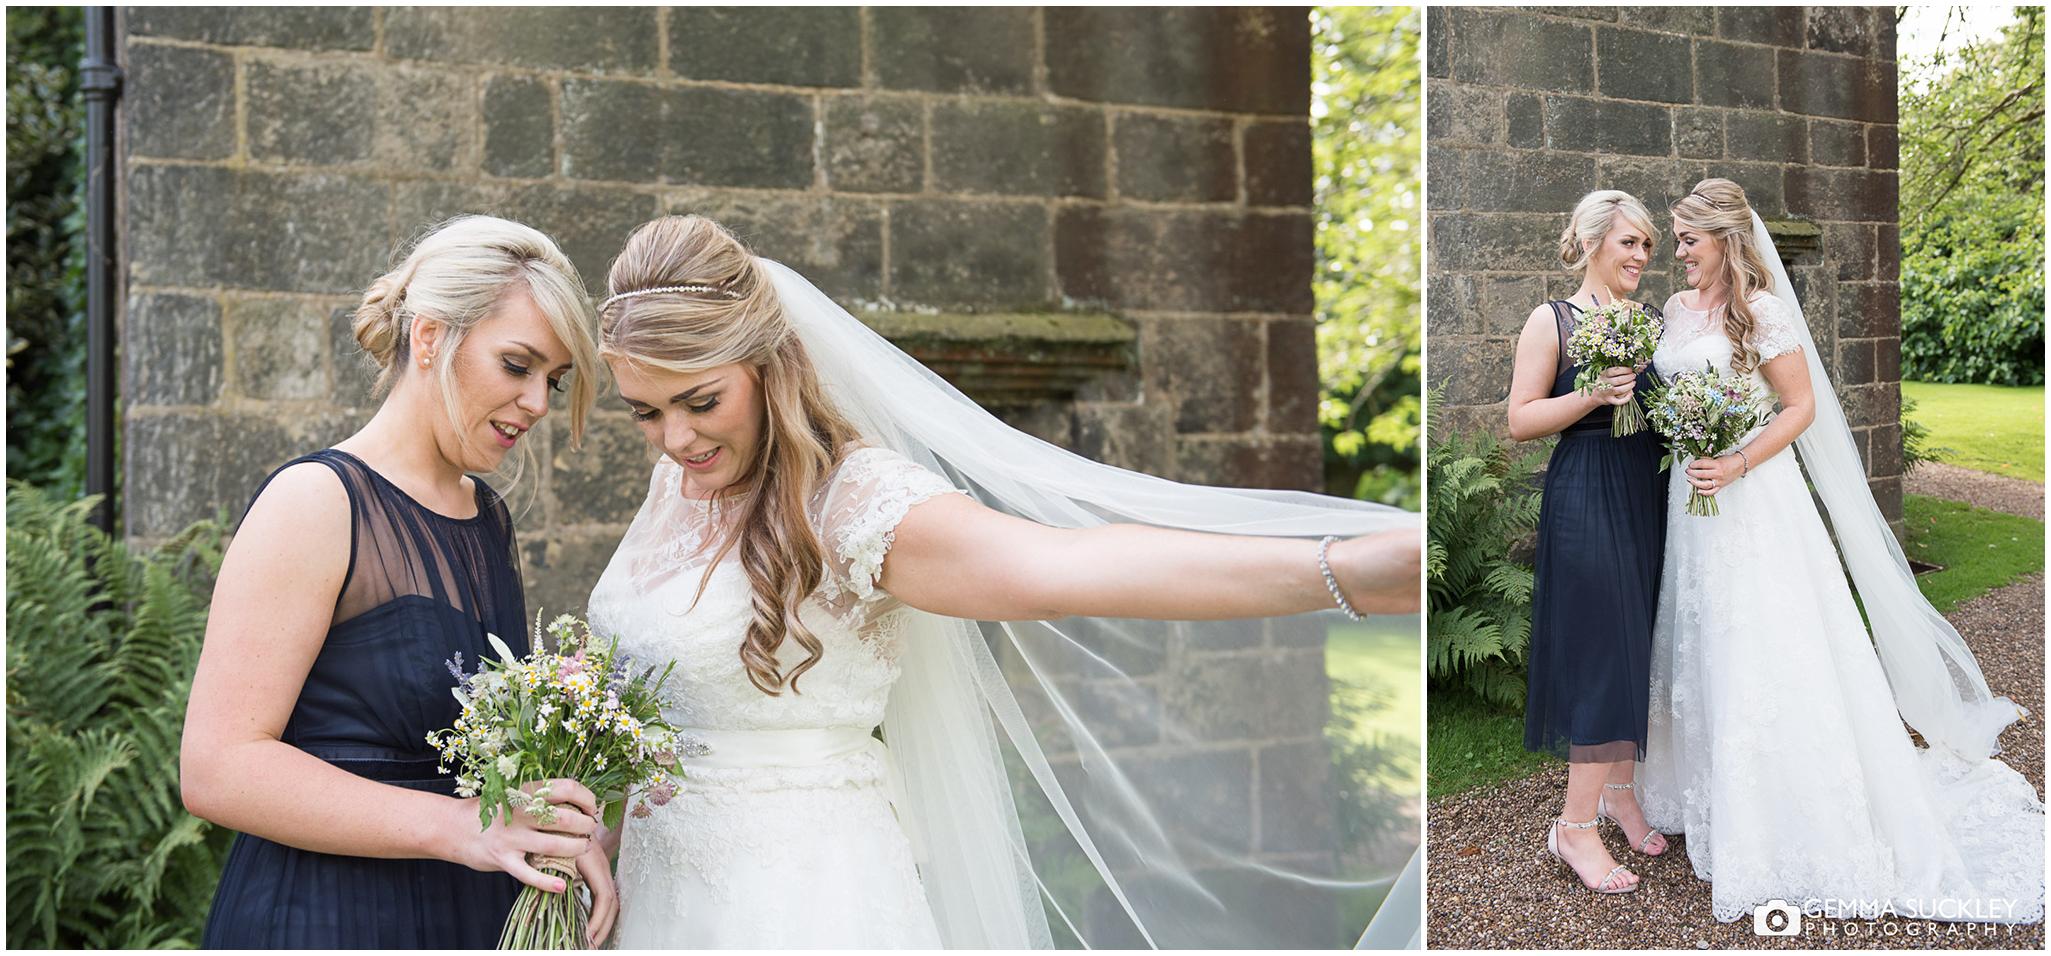 weddings-at-east-riddlesden-hall-6©gemmasuckleyphotography.jpg